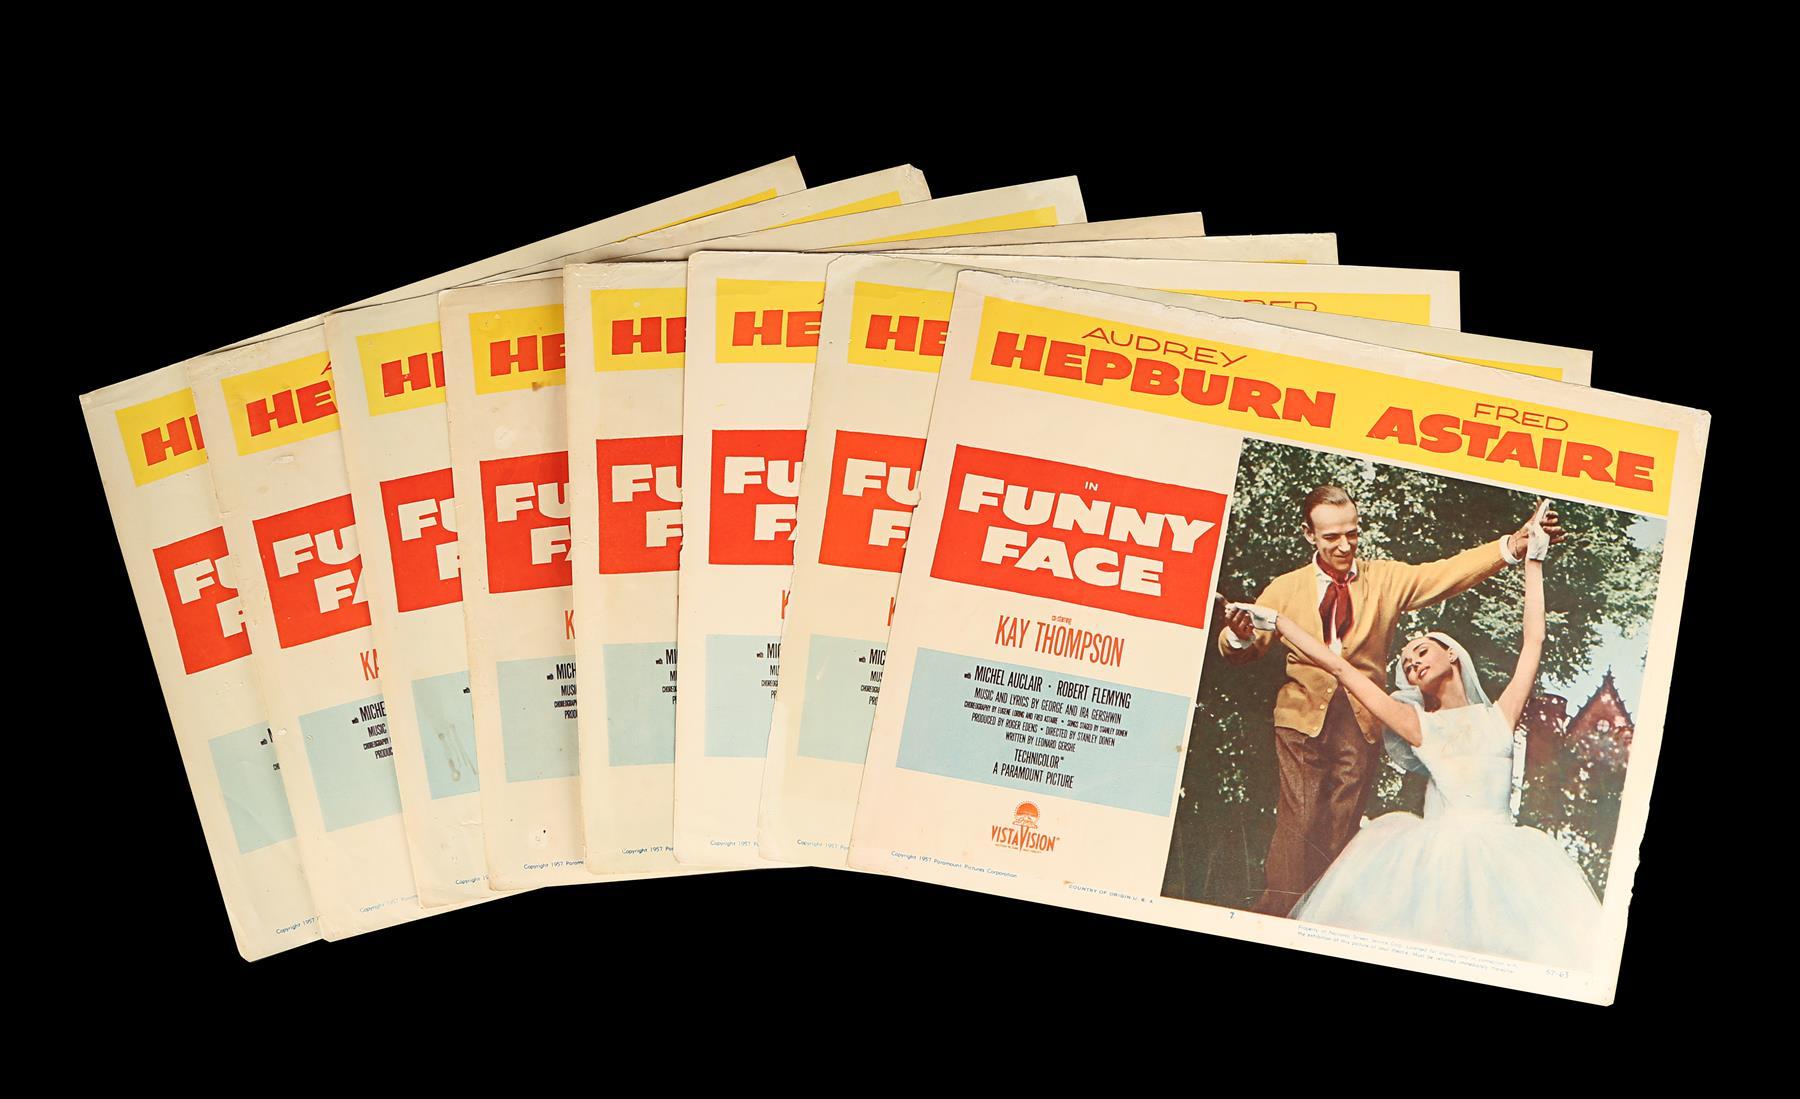 FUNNY FACE (1957) - Eight US Lobby Cards, 1957